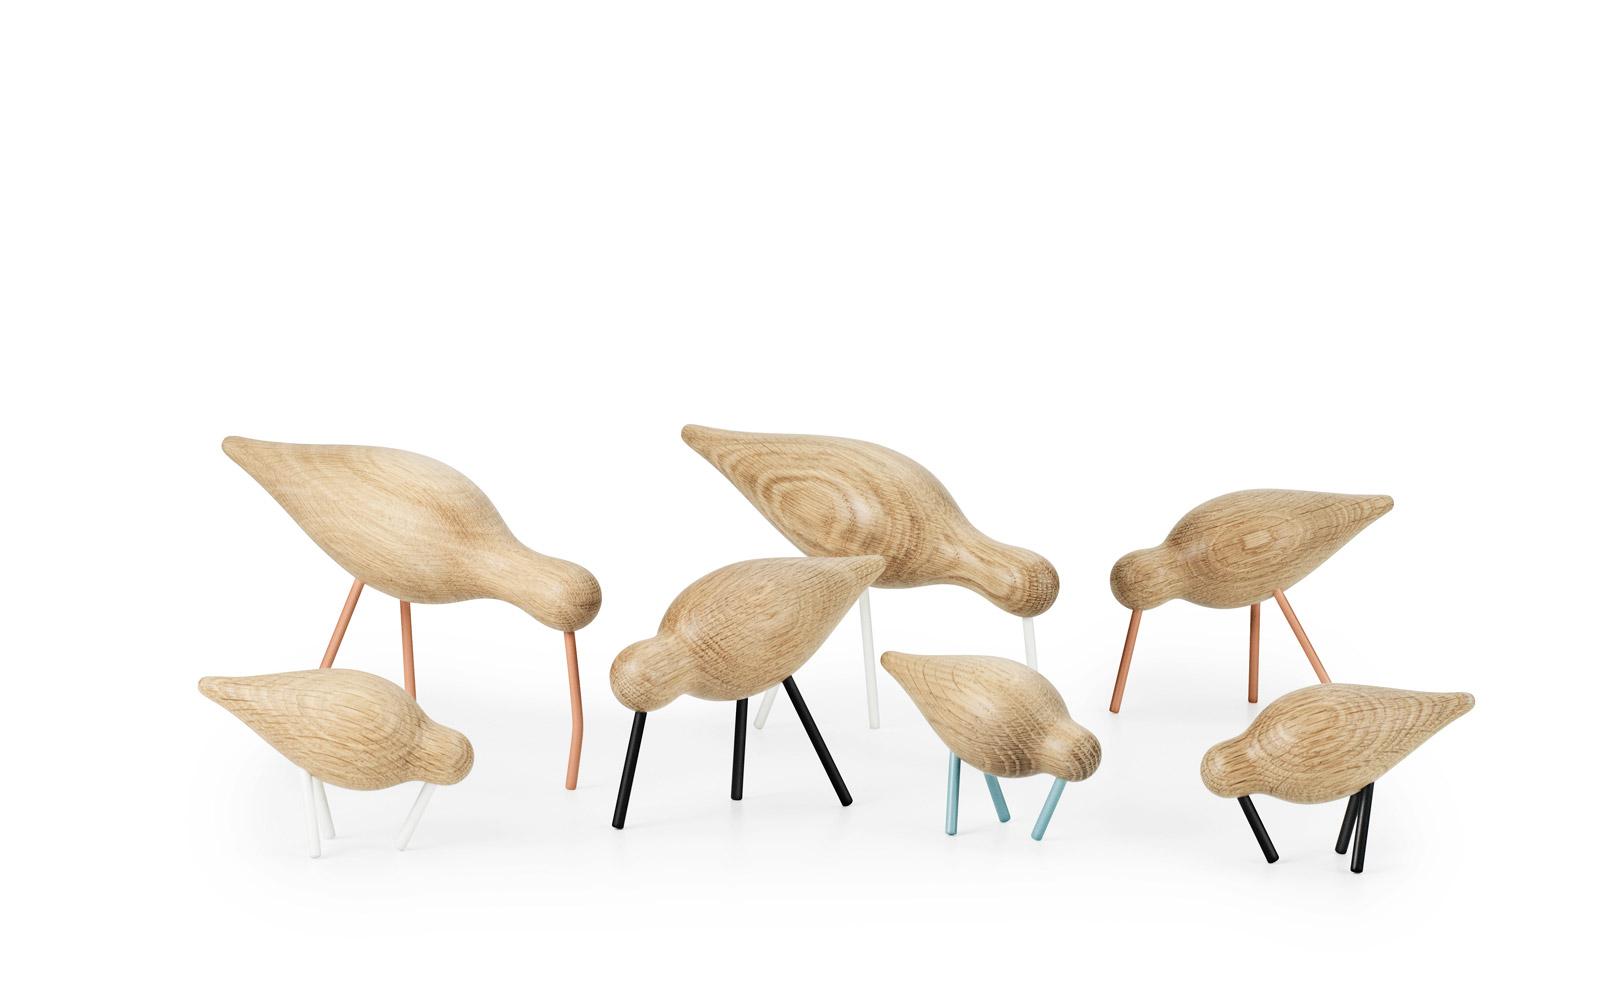 Normann Copenhagen shore birds